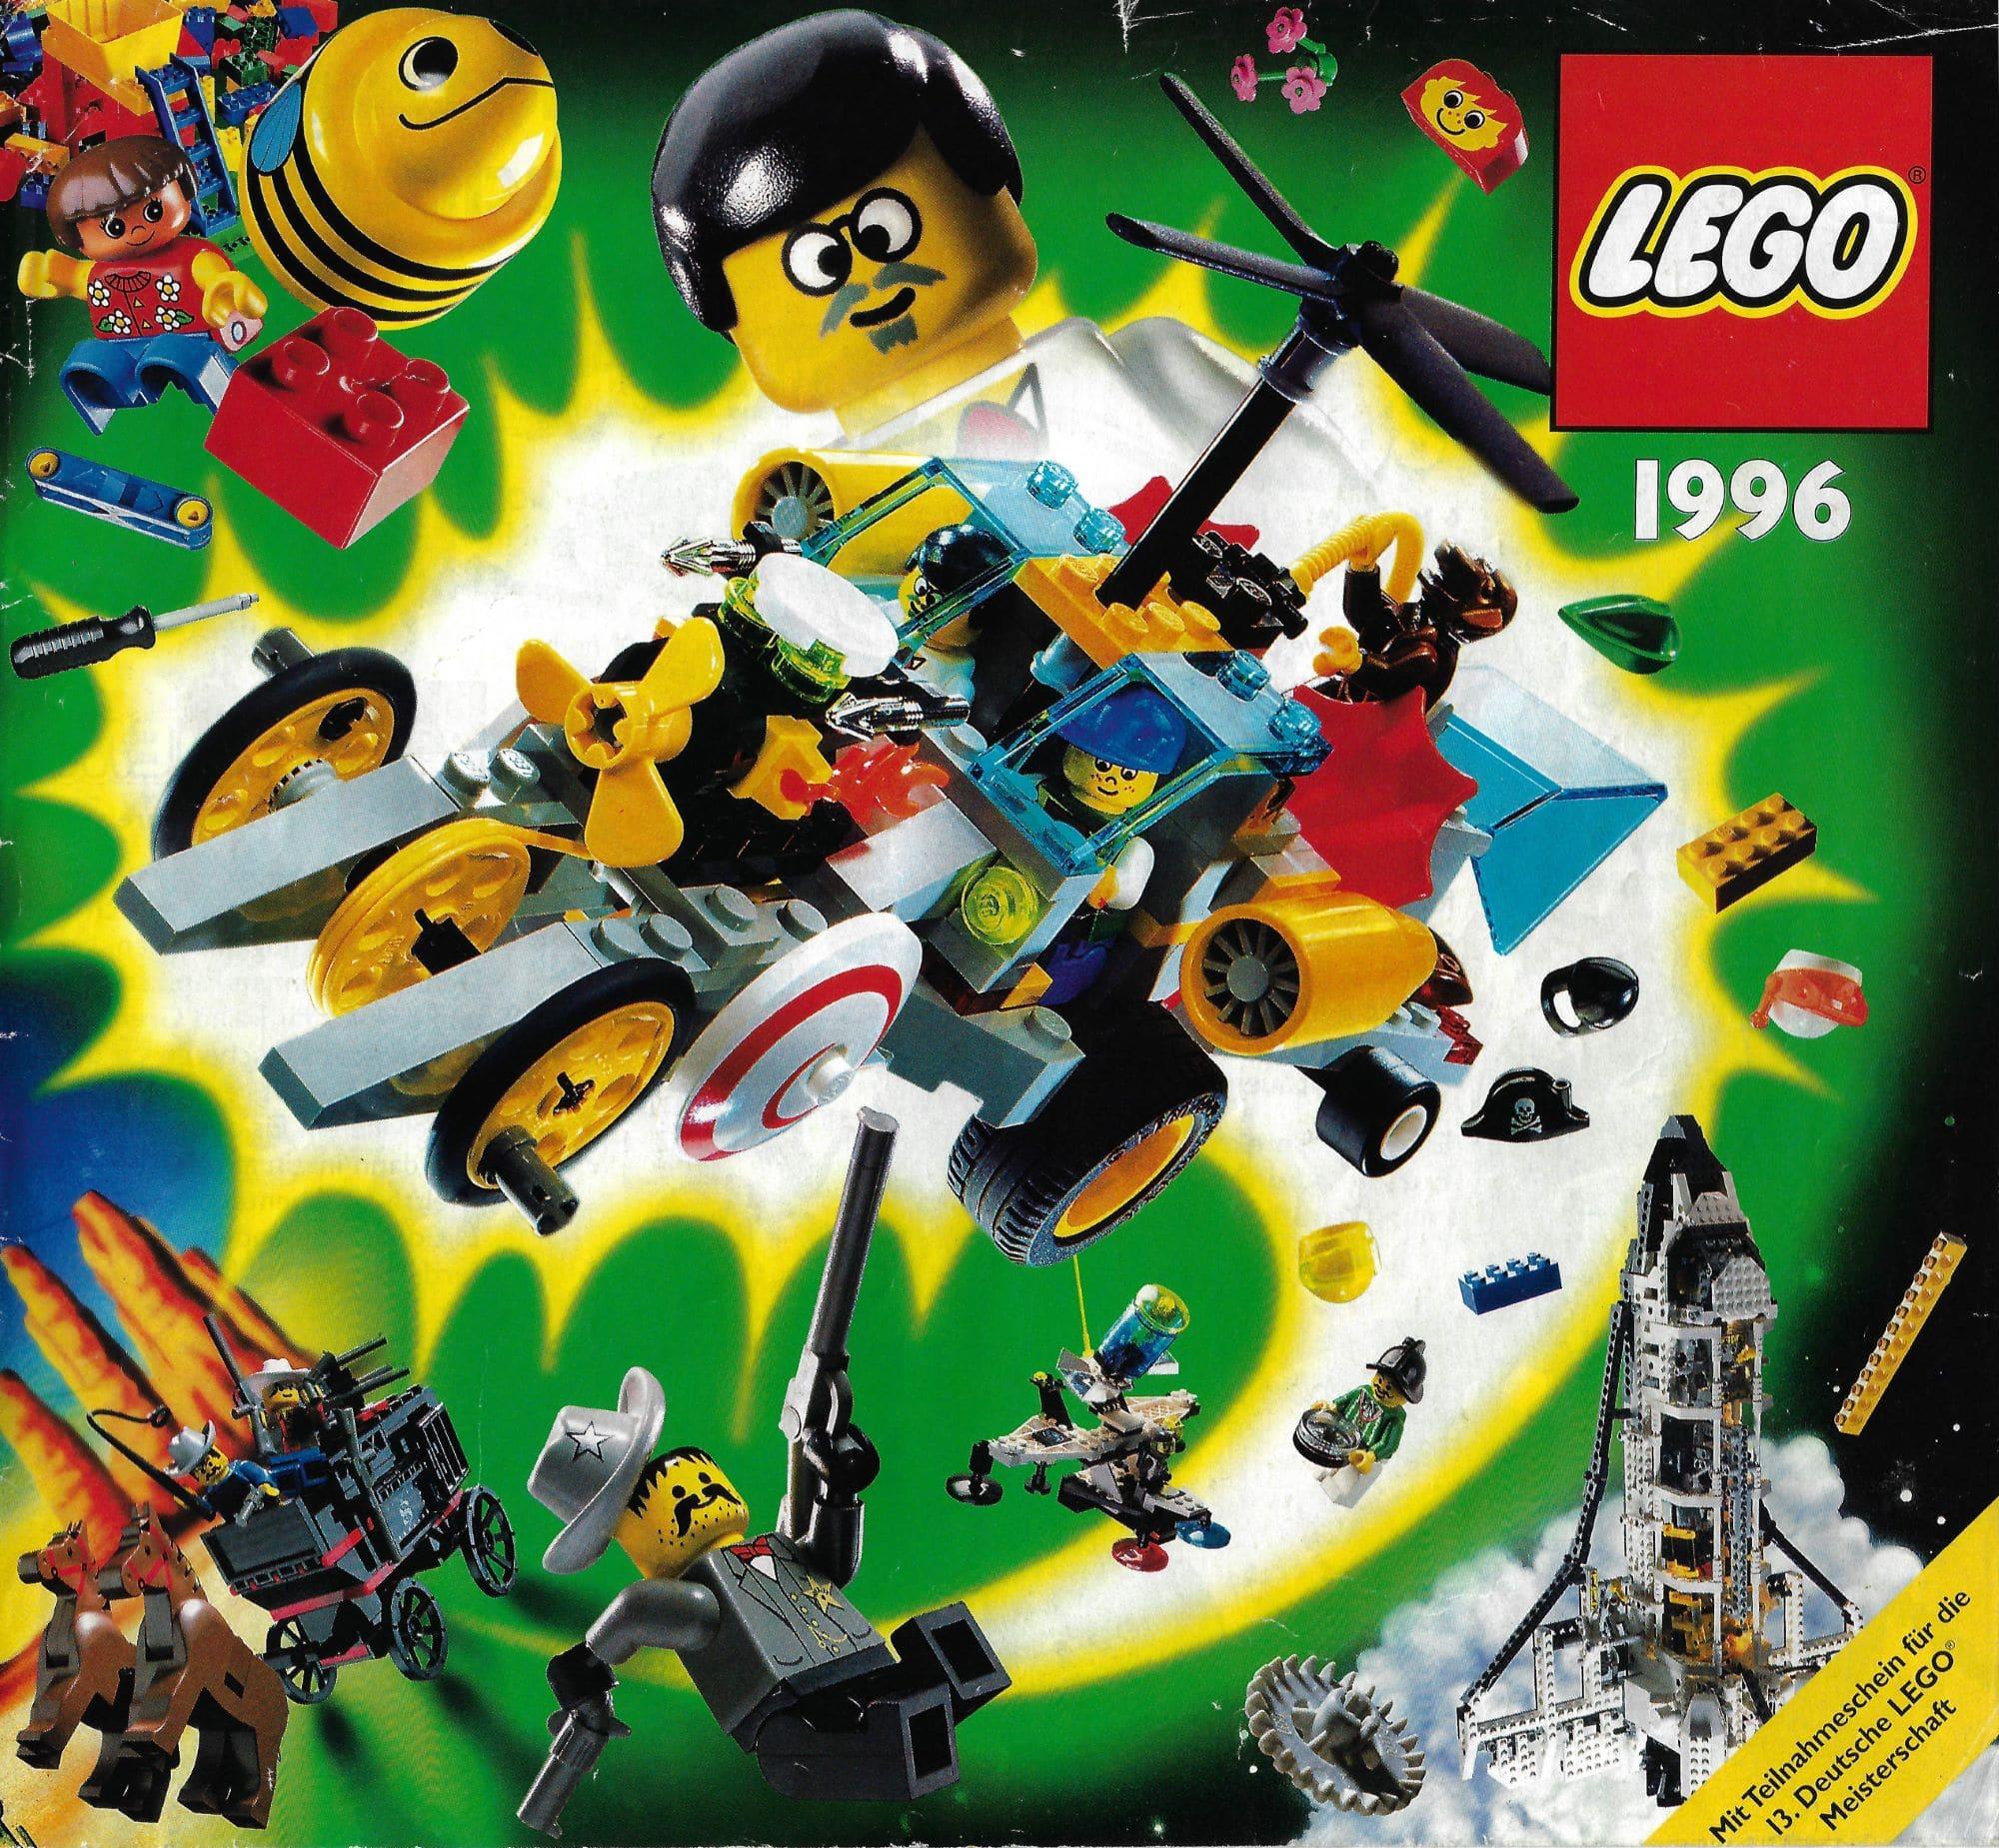 LEGO Time Cruisers Katalog De 1996 Cover